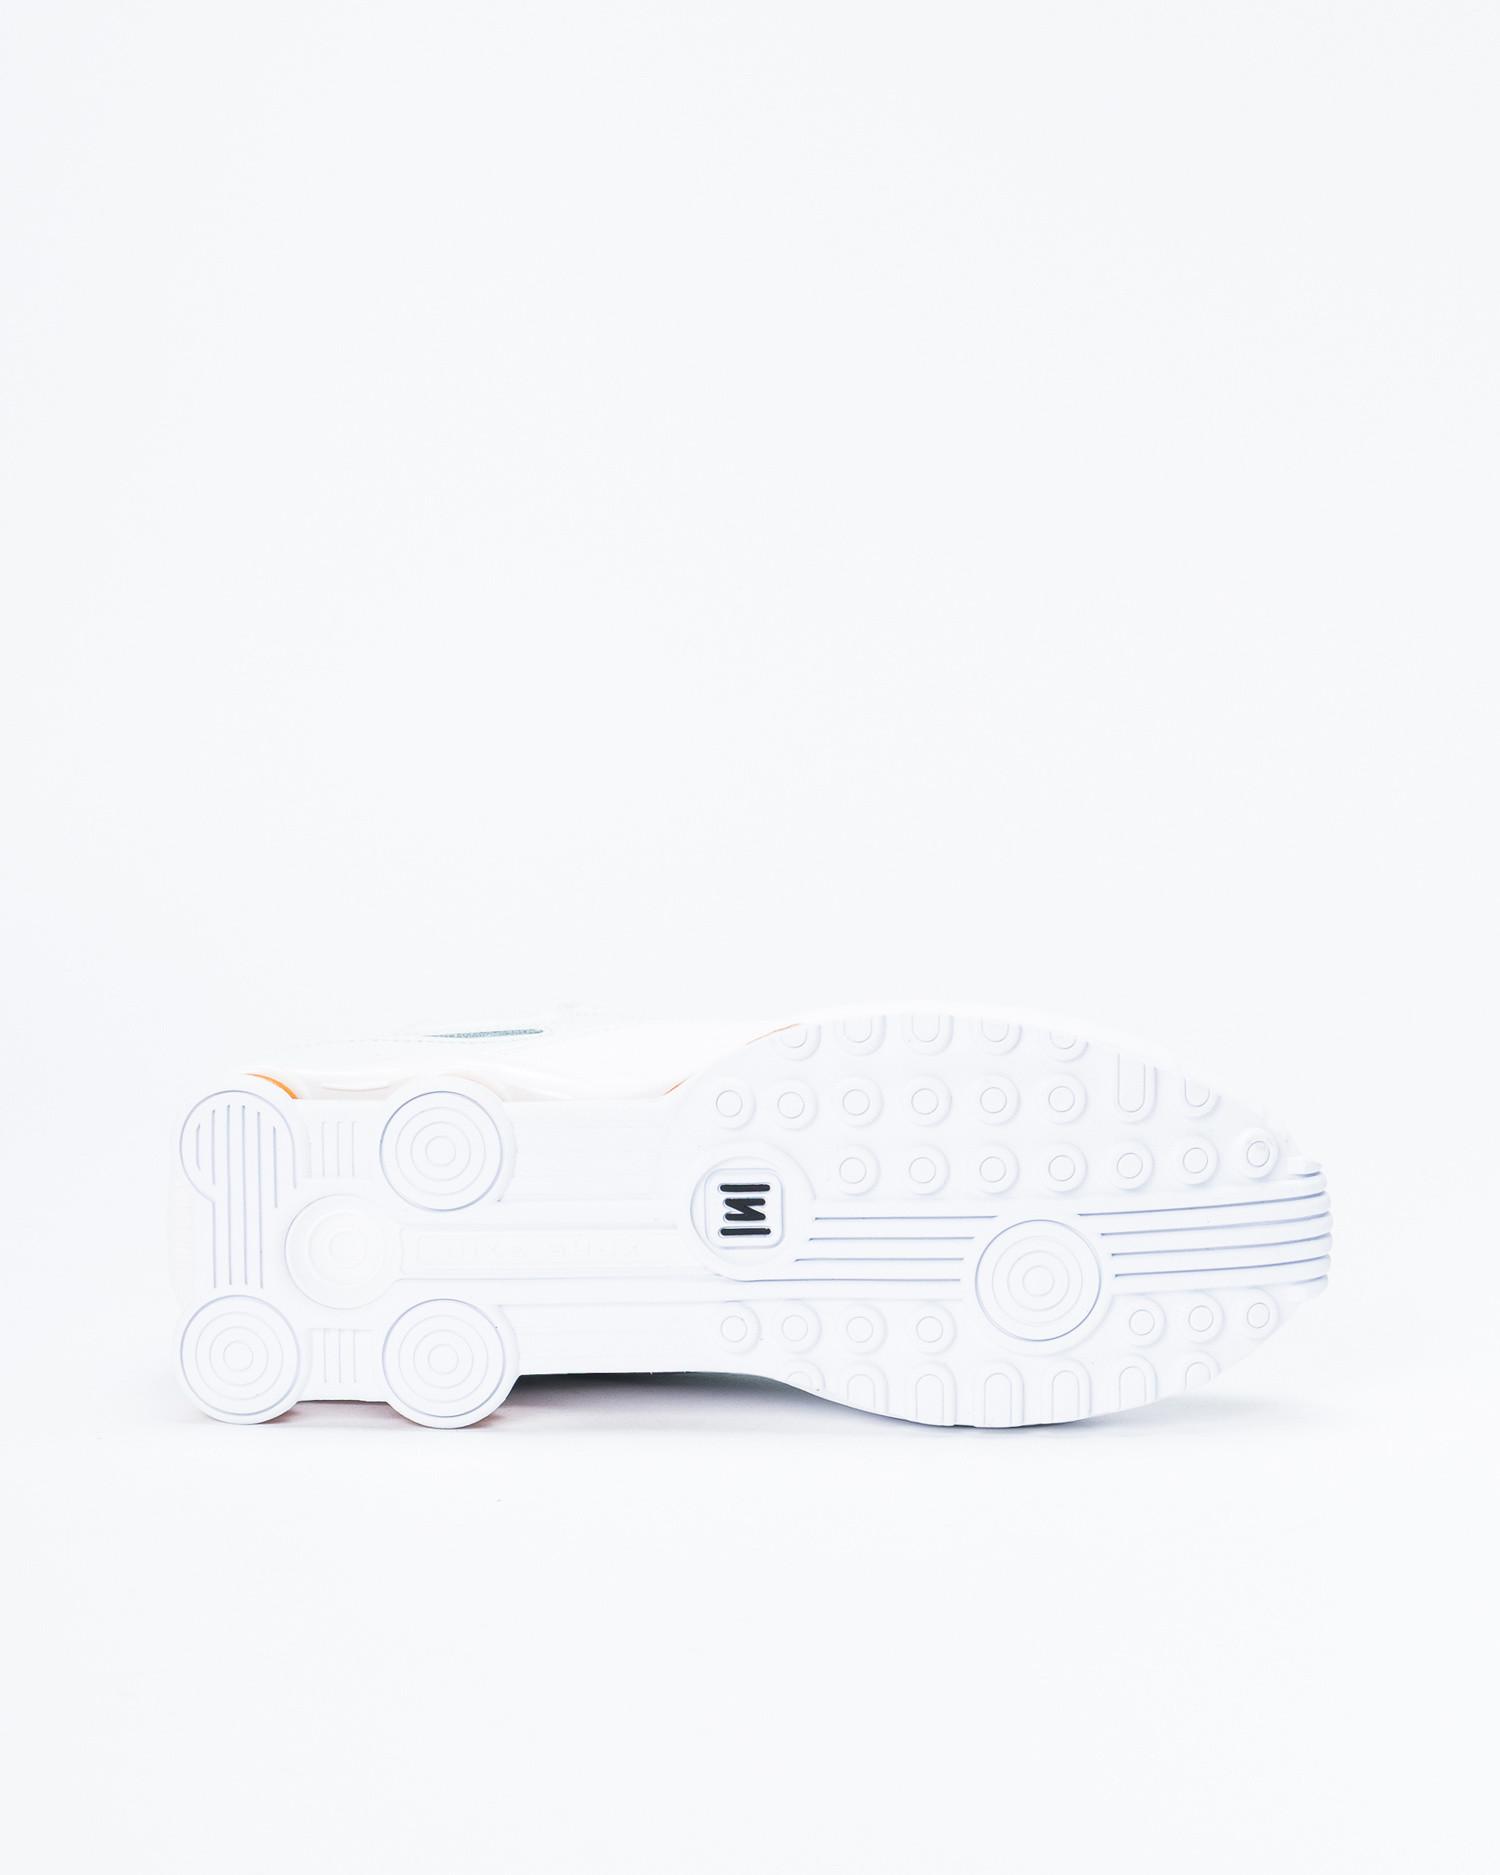 Nike Shox Enigma 9000 Ghost aqua/white-mtlc hematite